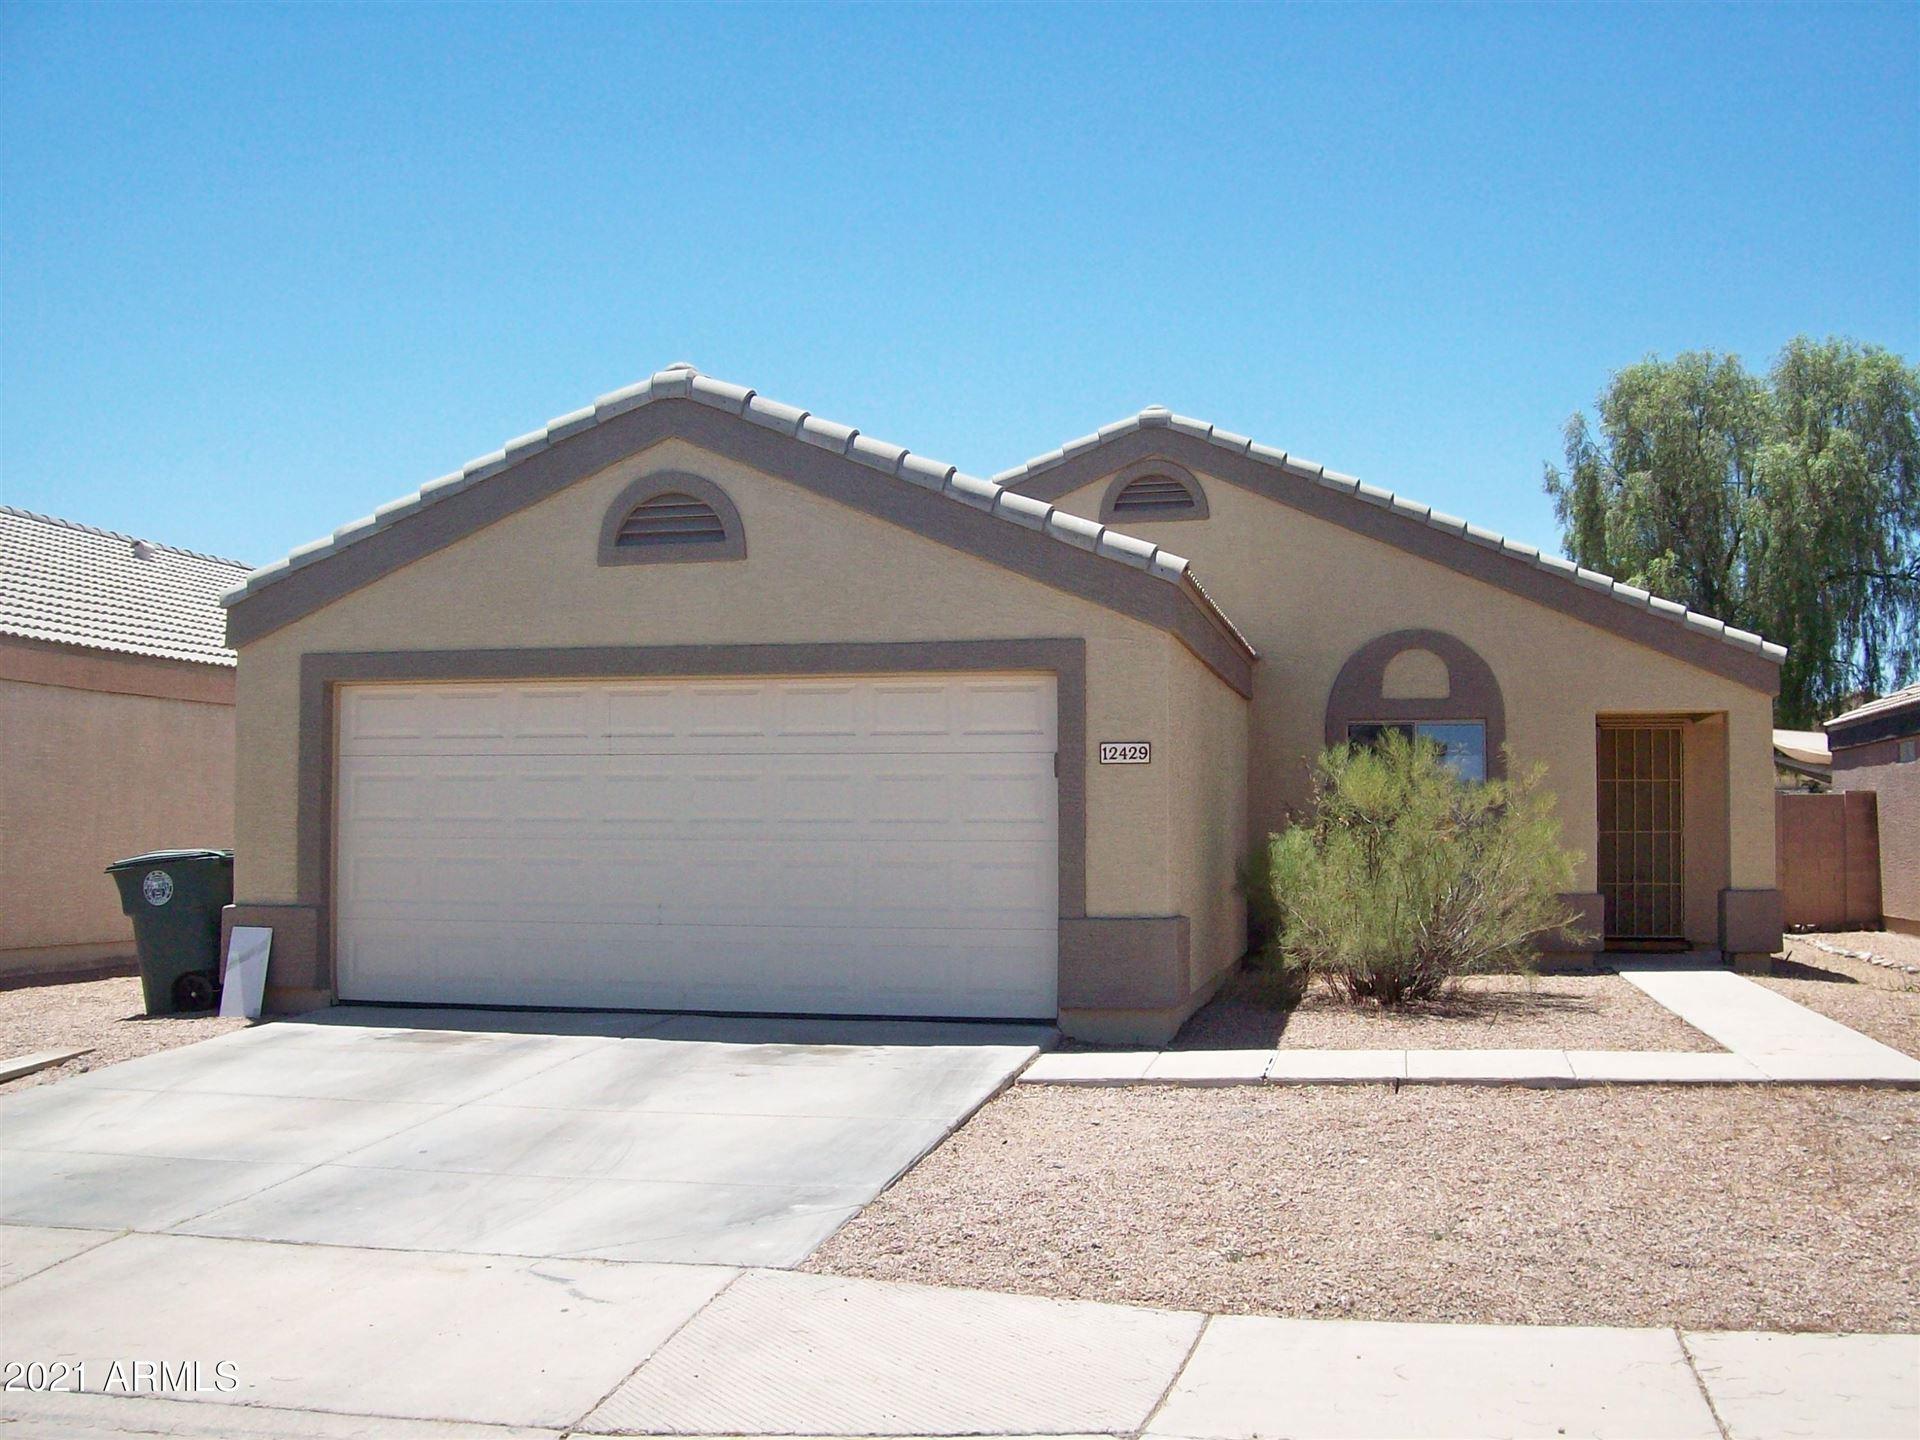 Photo of 12429 W LARKSPUR Road, El Mirage, AZ 85335 (MLS # 6249484)